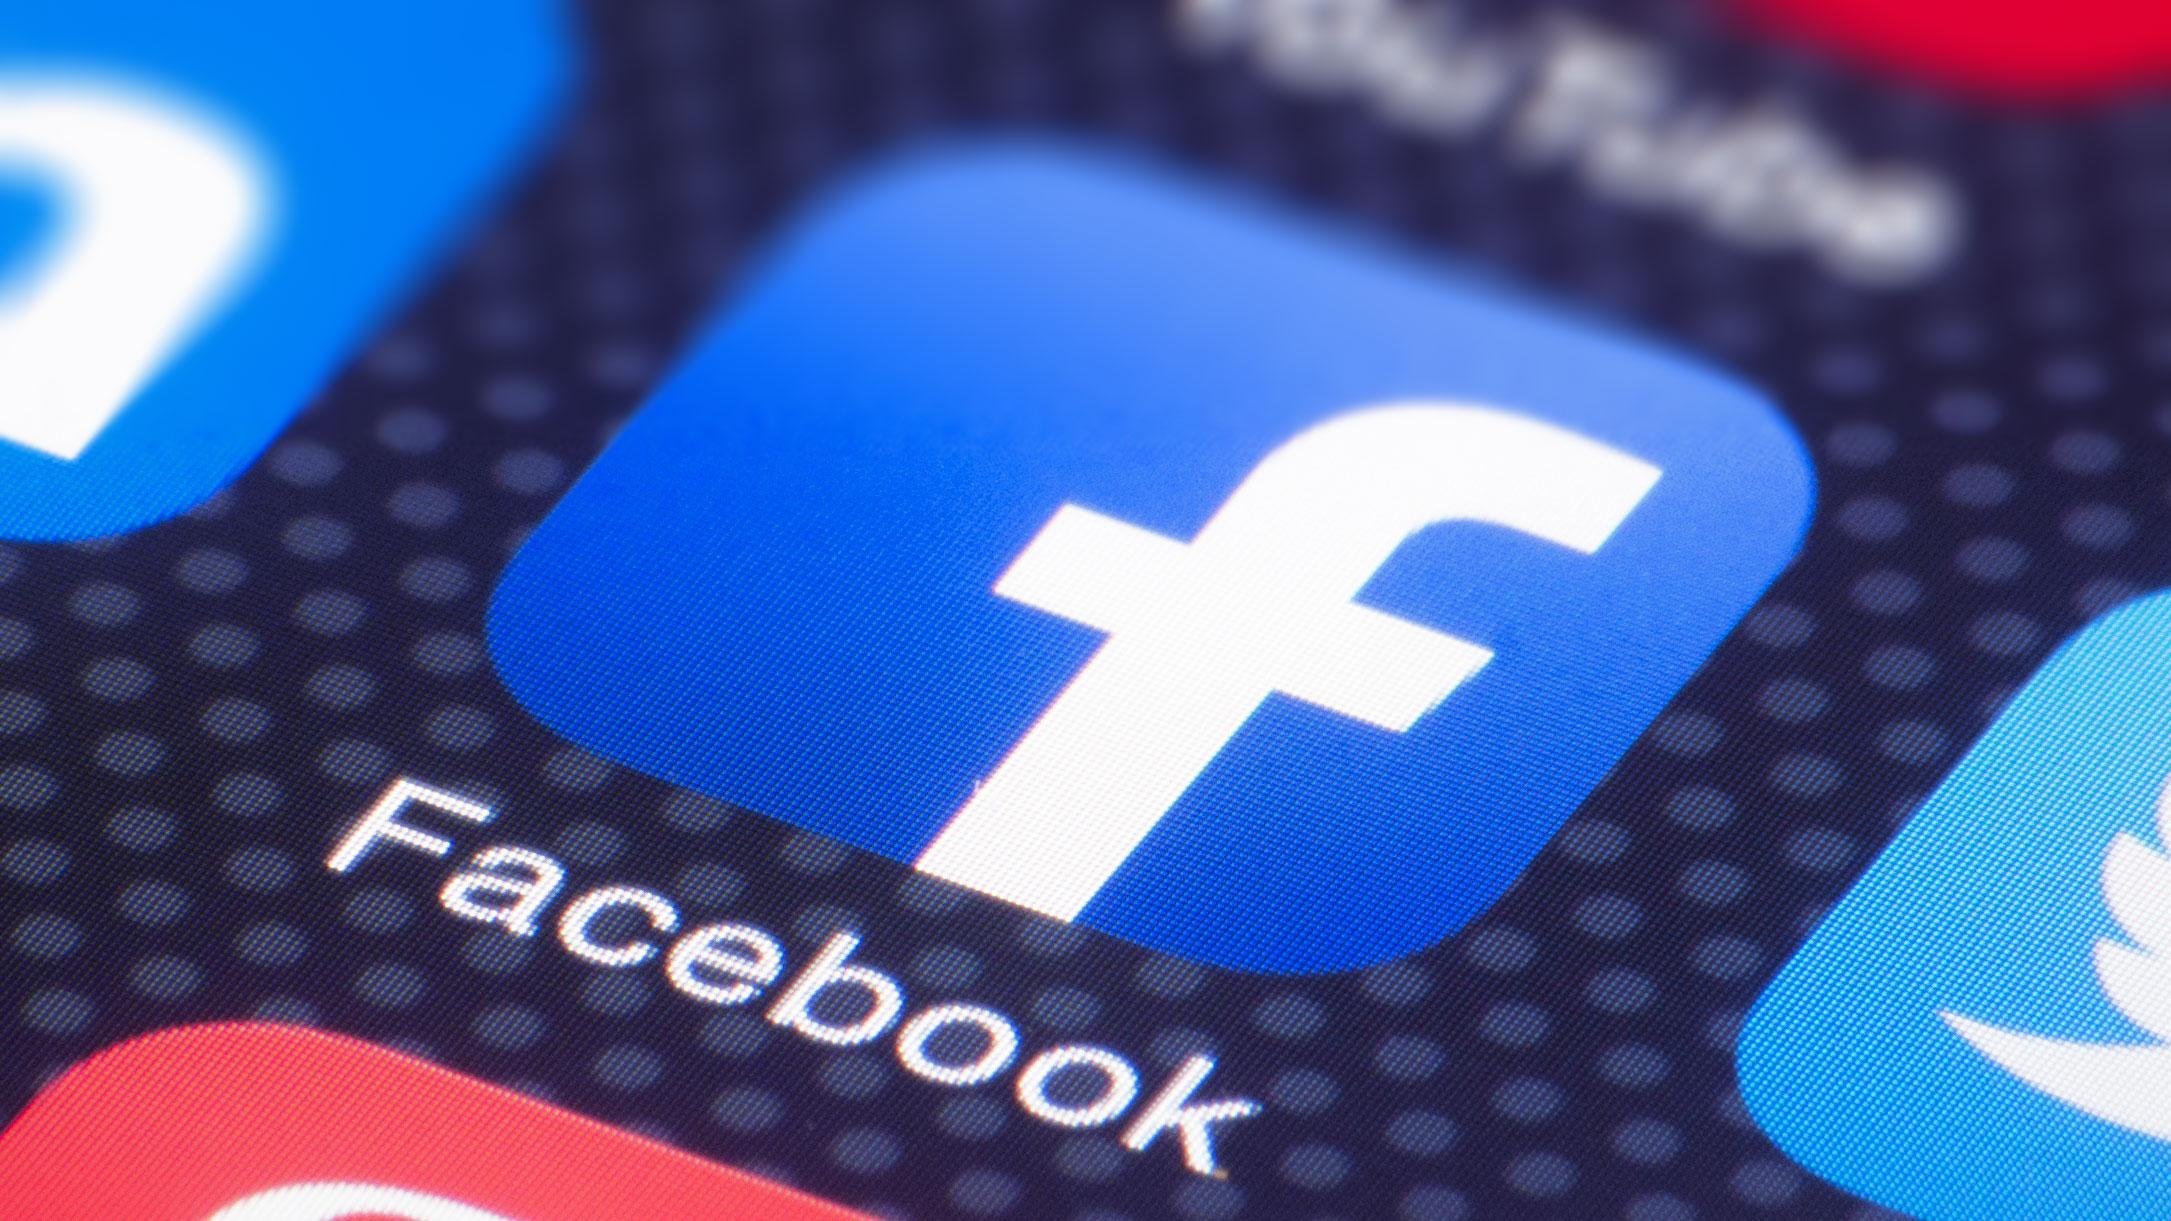 Facebook prevé un 2021 difícil a pesar de que pandemia disparó sus ganancias